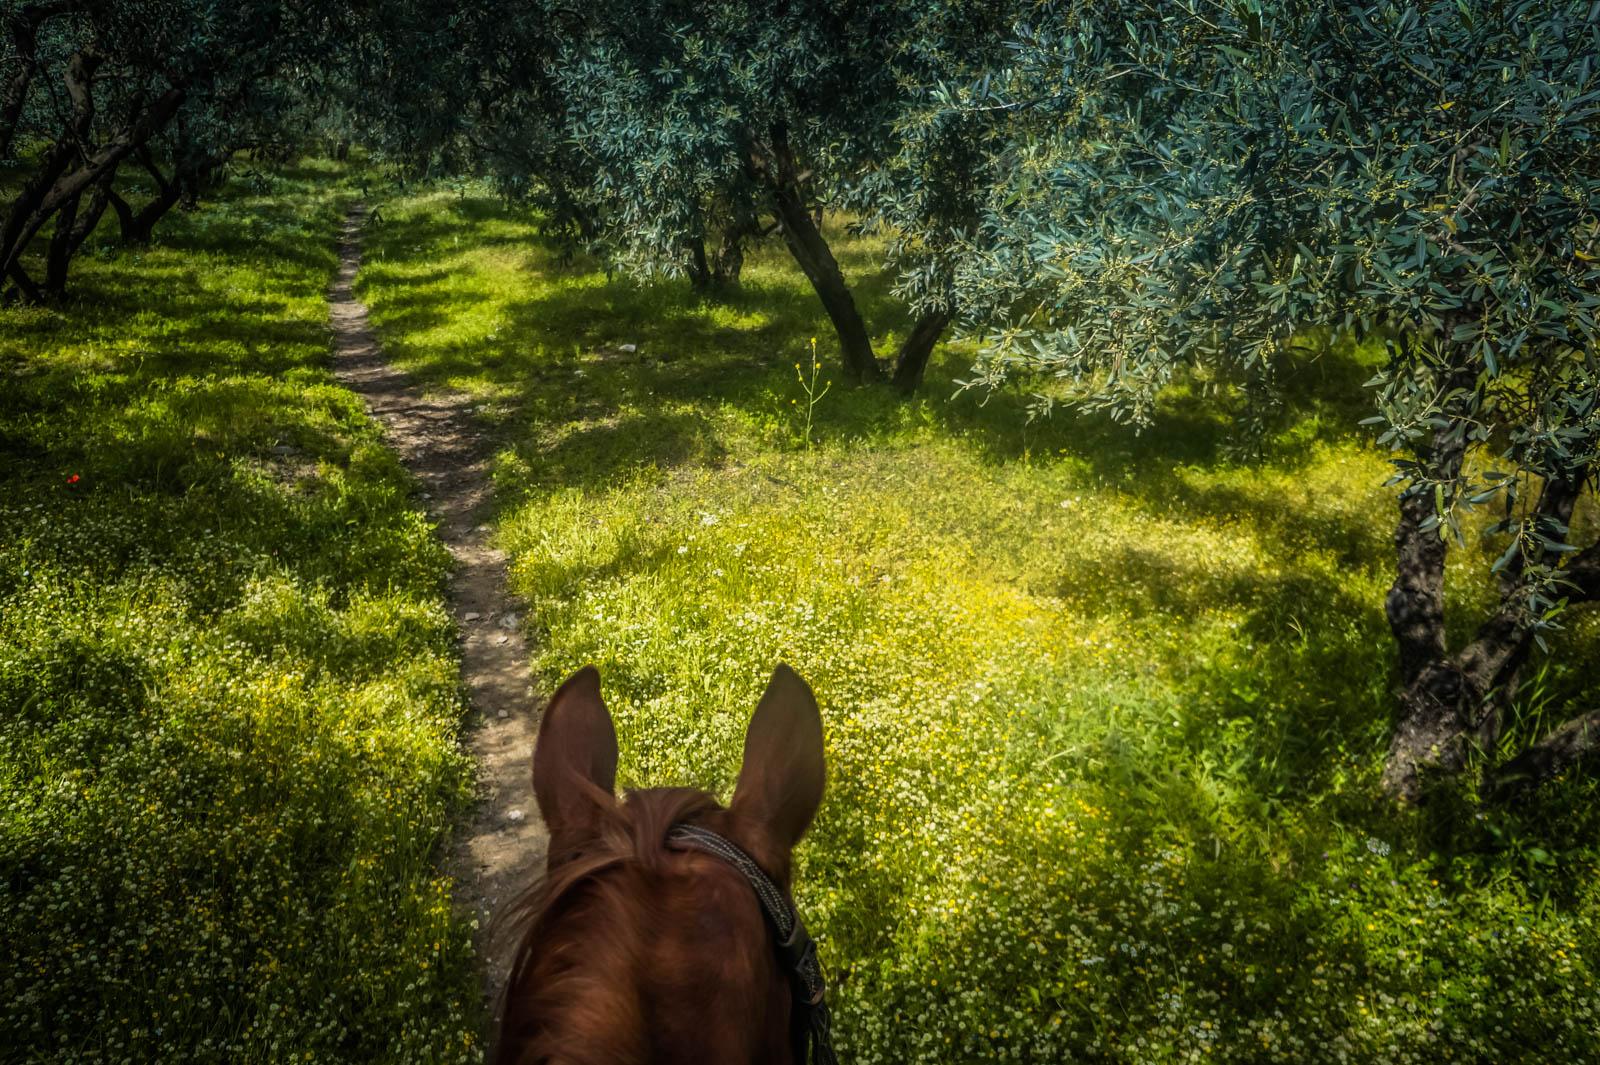 horseback-riding-pelion-greece-la-vie-en-blog-all-rights-reserved-6